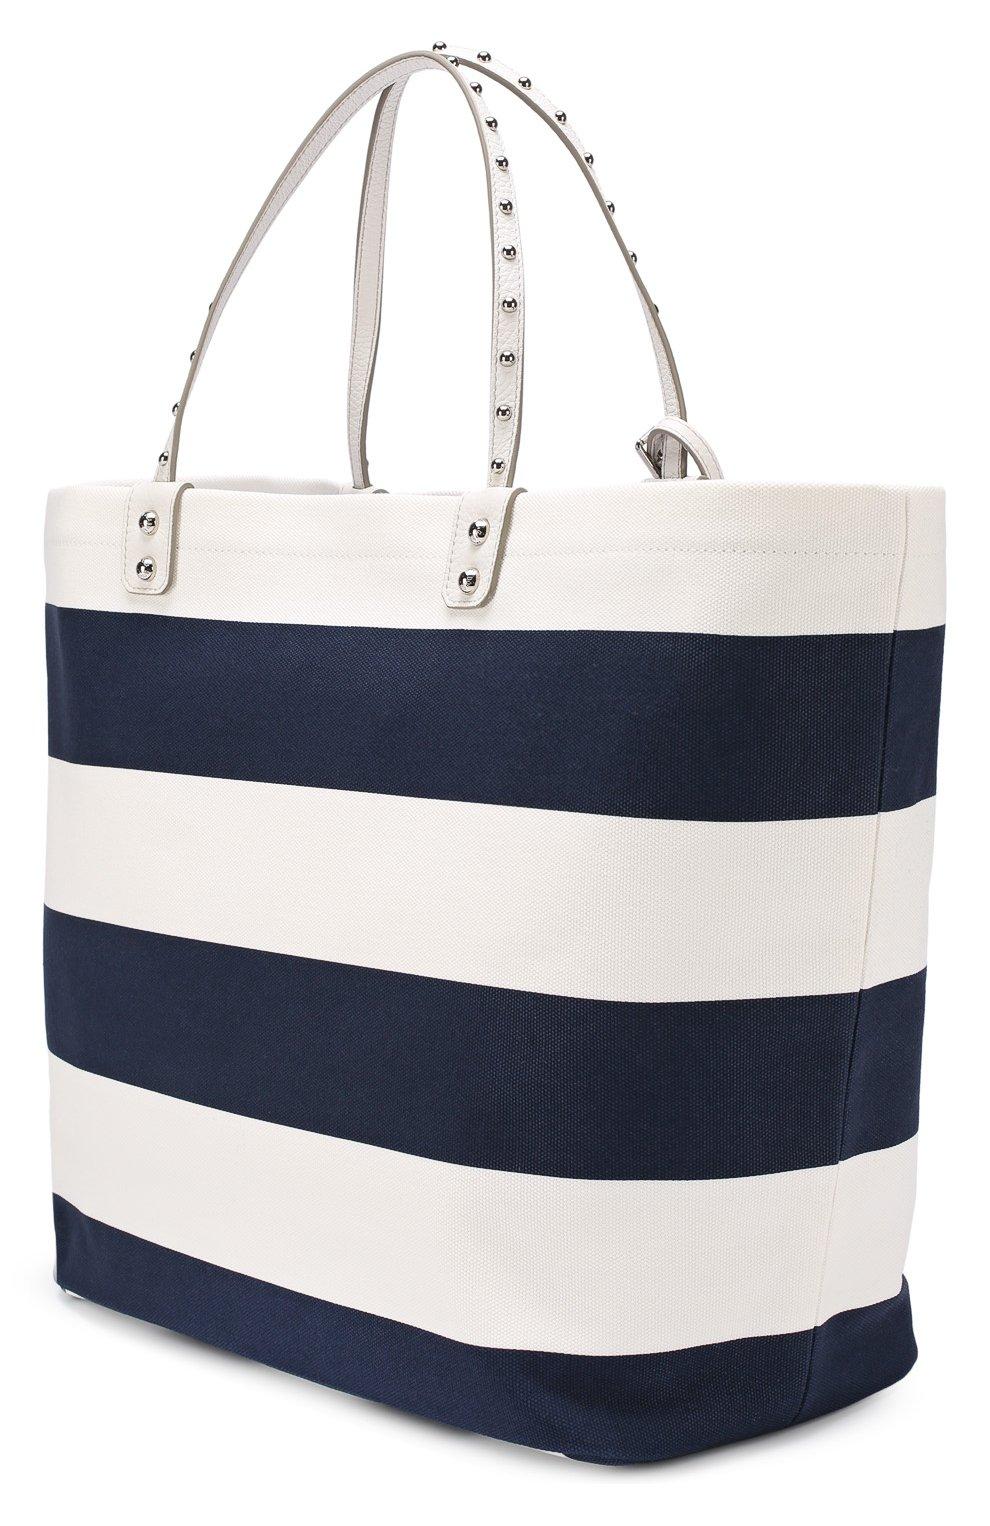 Текстильная сумка Beatrice с металлическим декором Dolce & Gabbana синяя цвета | Фото №2